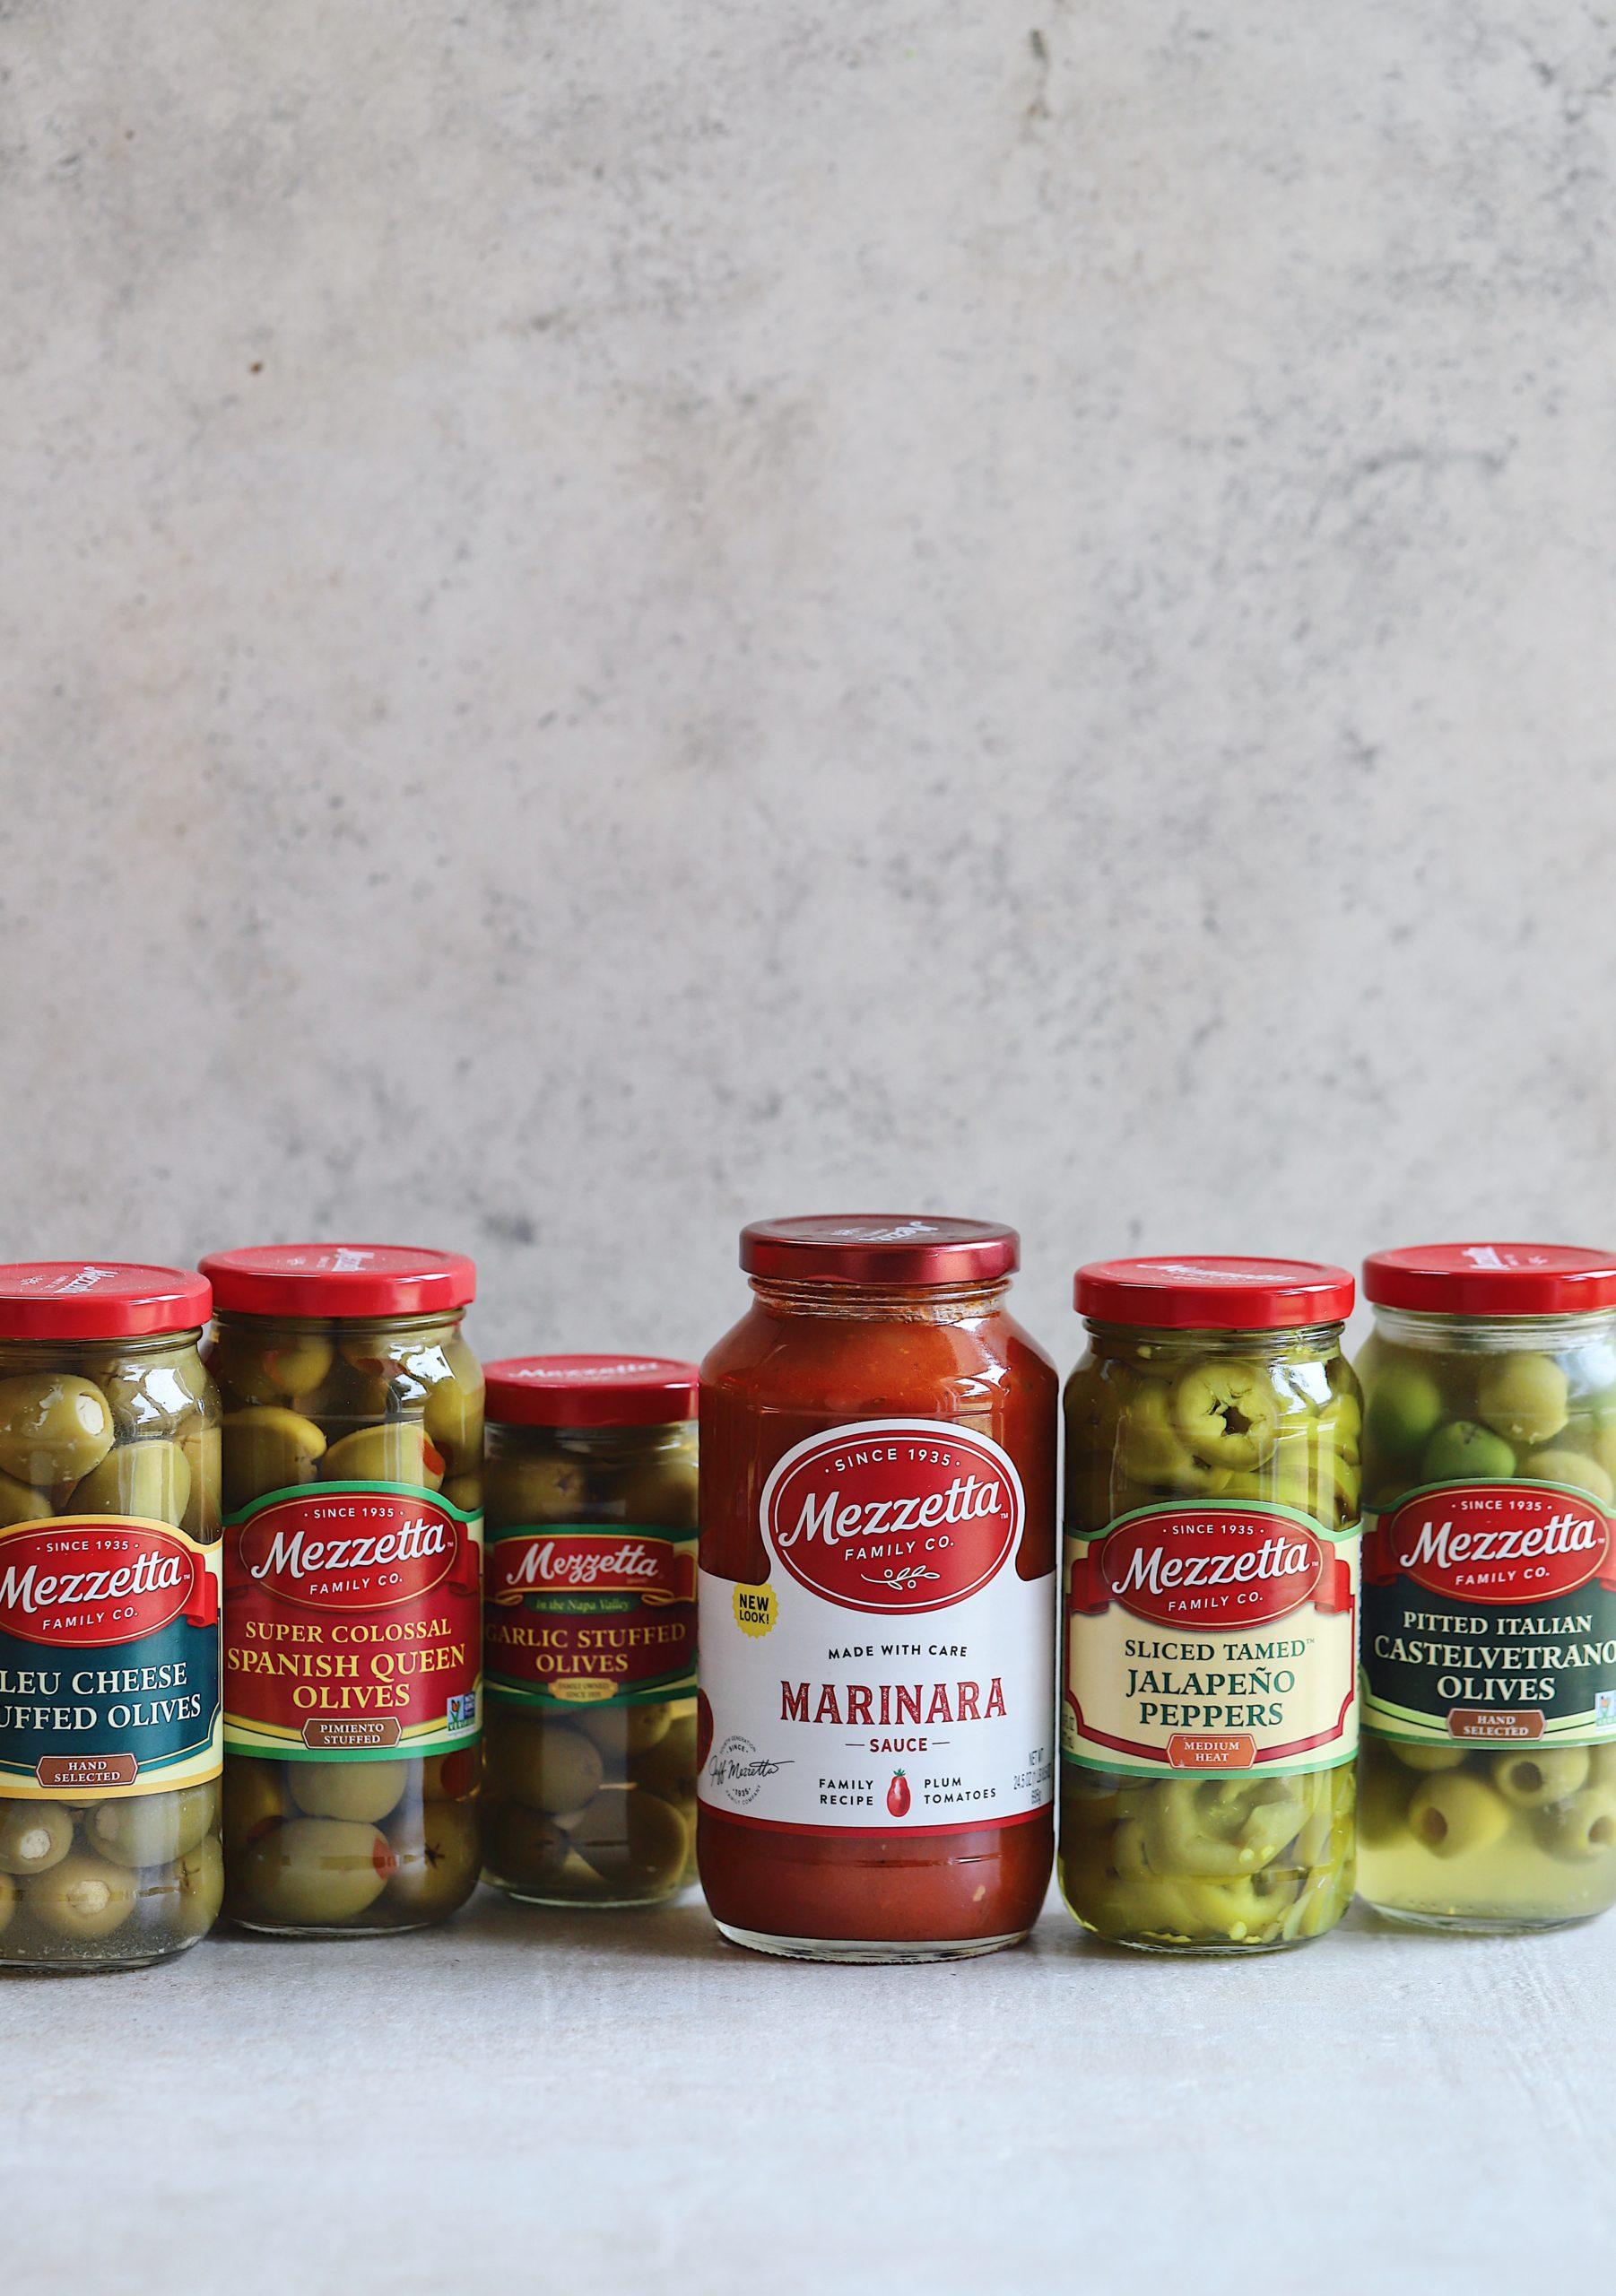 Mezzetta Products scaled